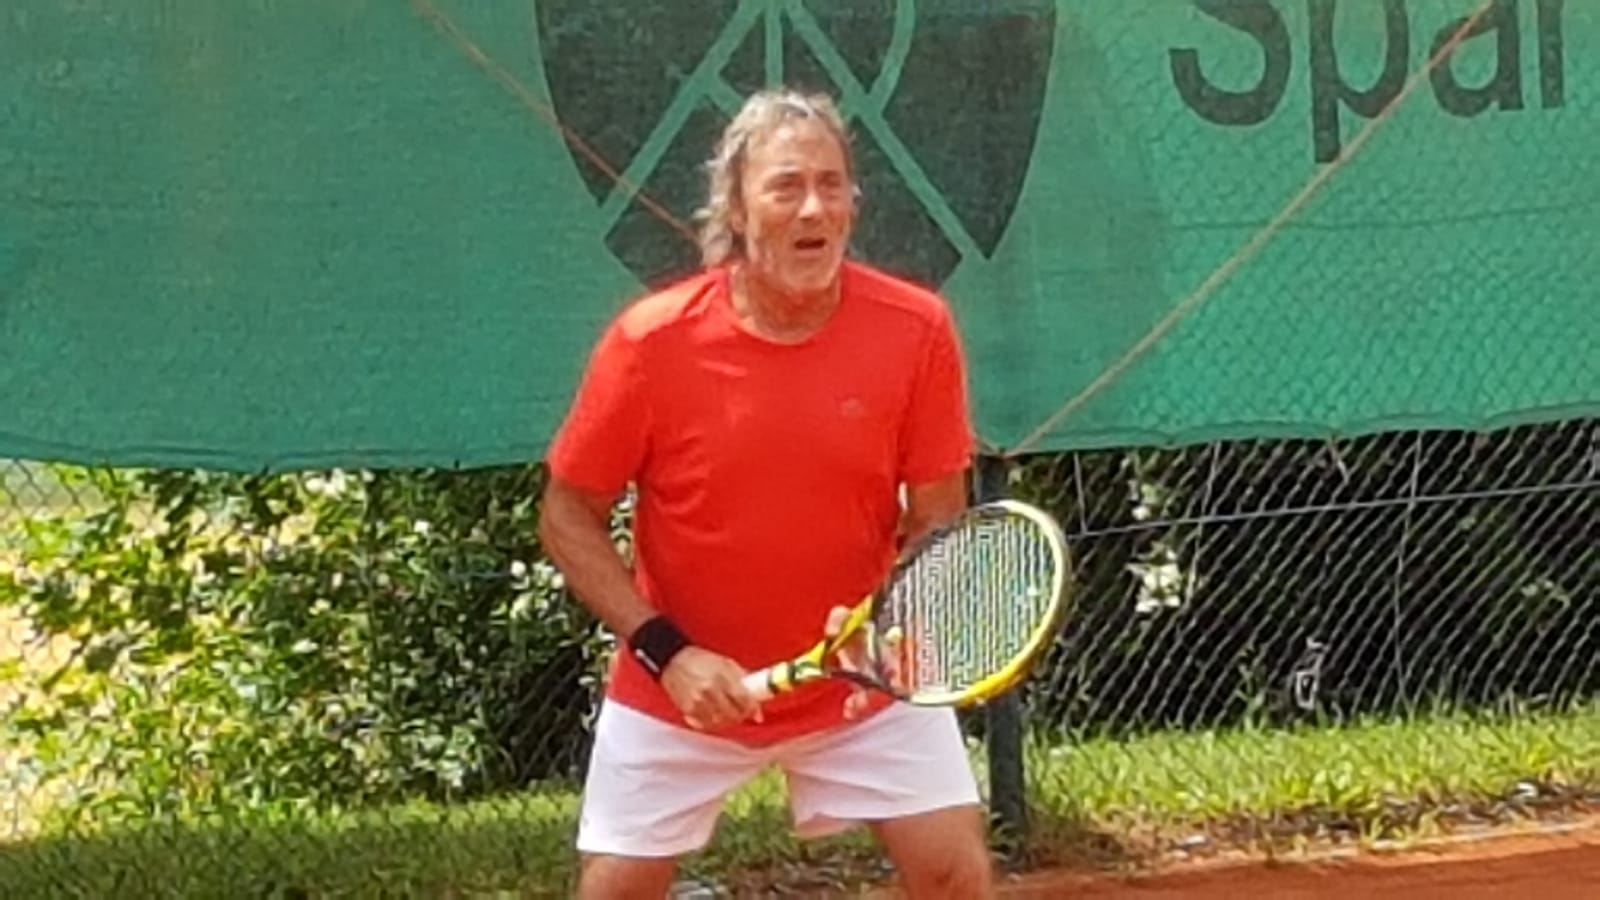 5.2 Tennis